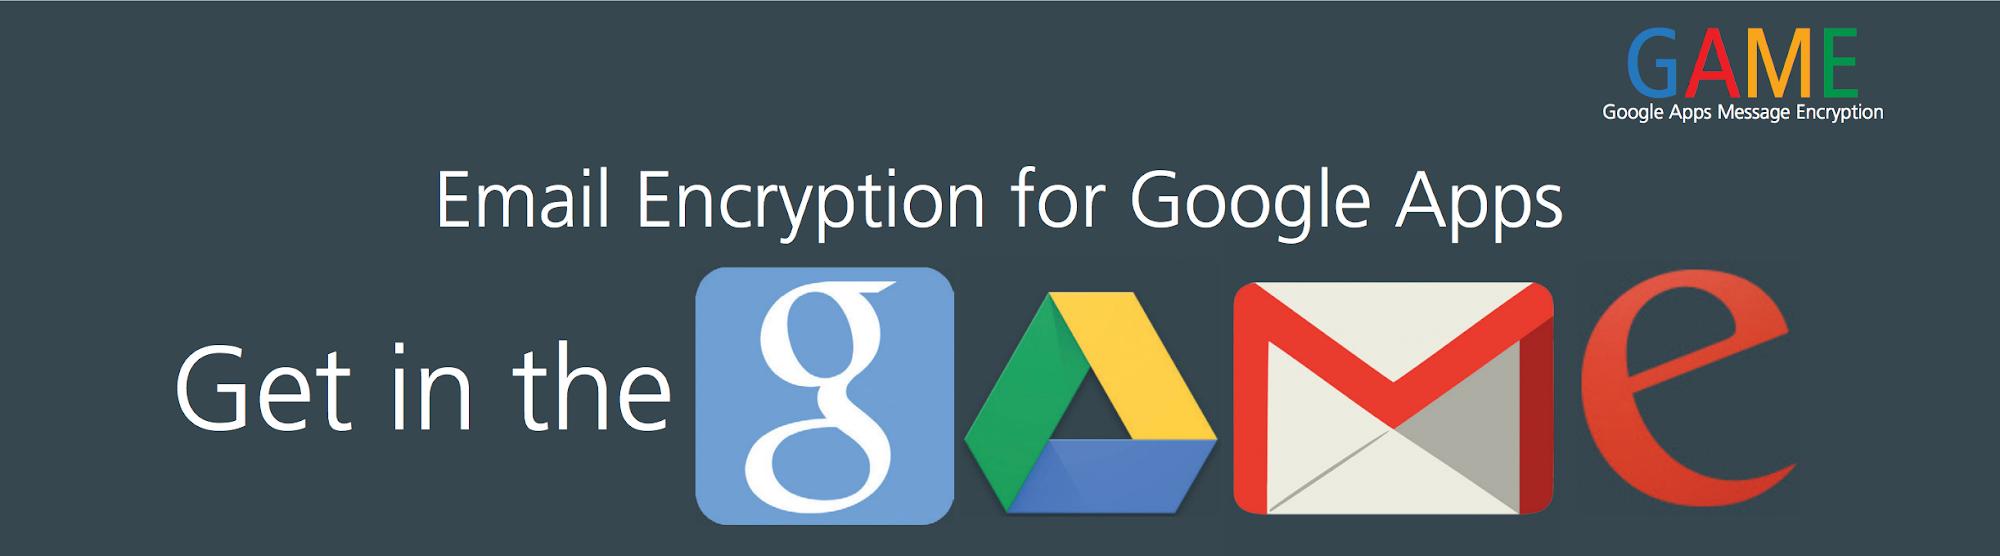 Google Apps Message Encryption Demo